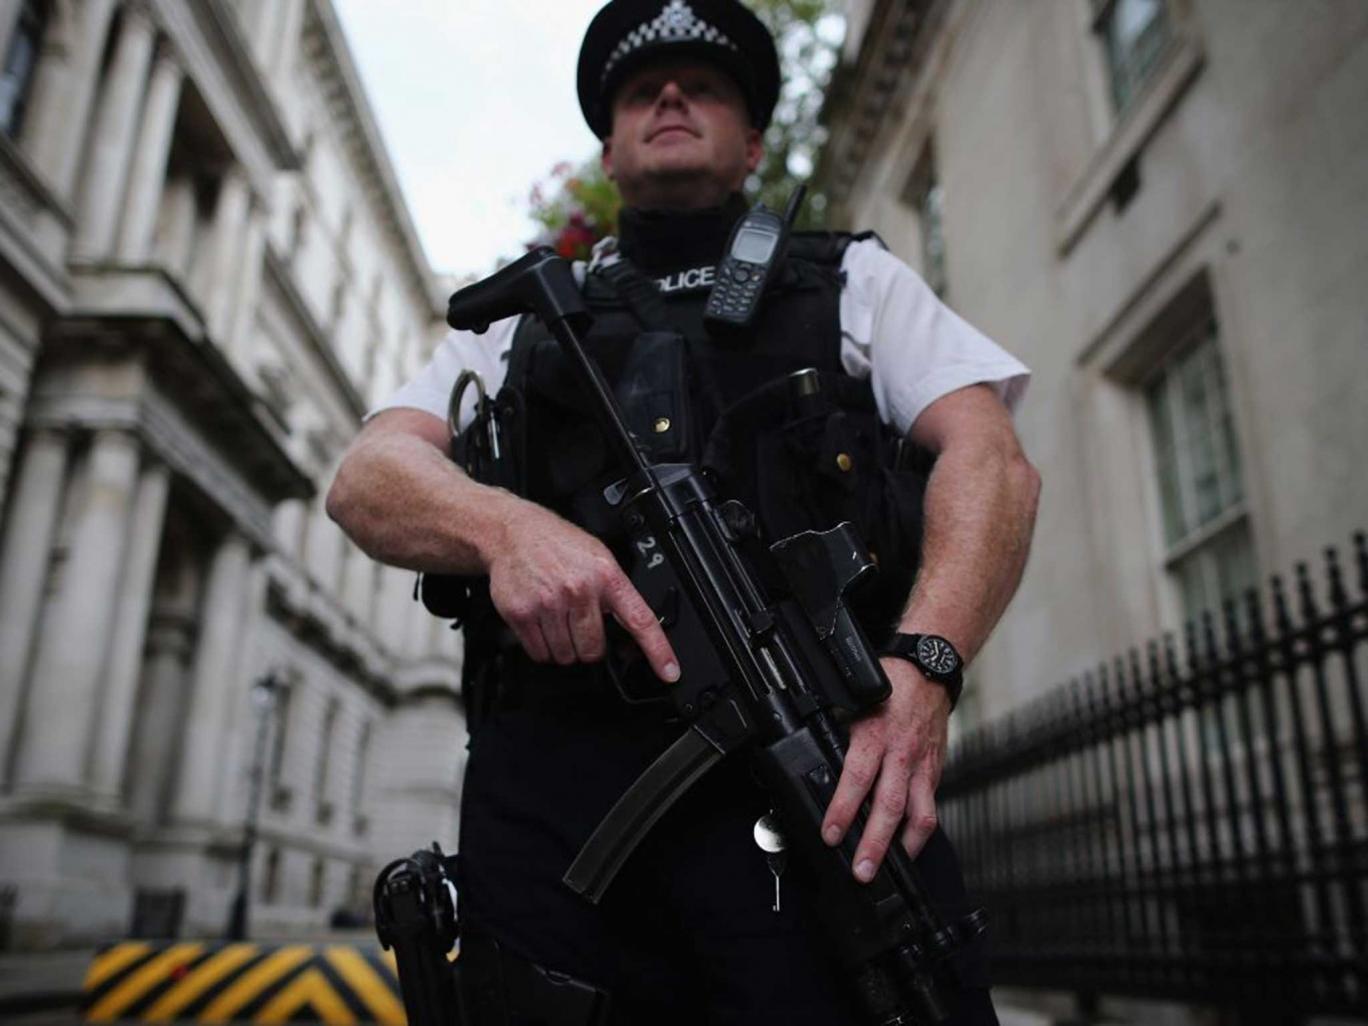 Power talks: Police guard Downing Street